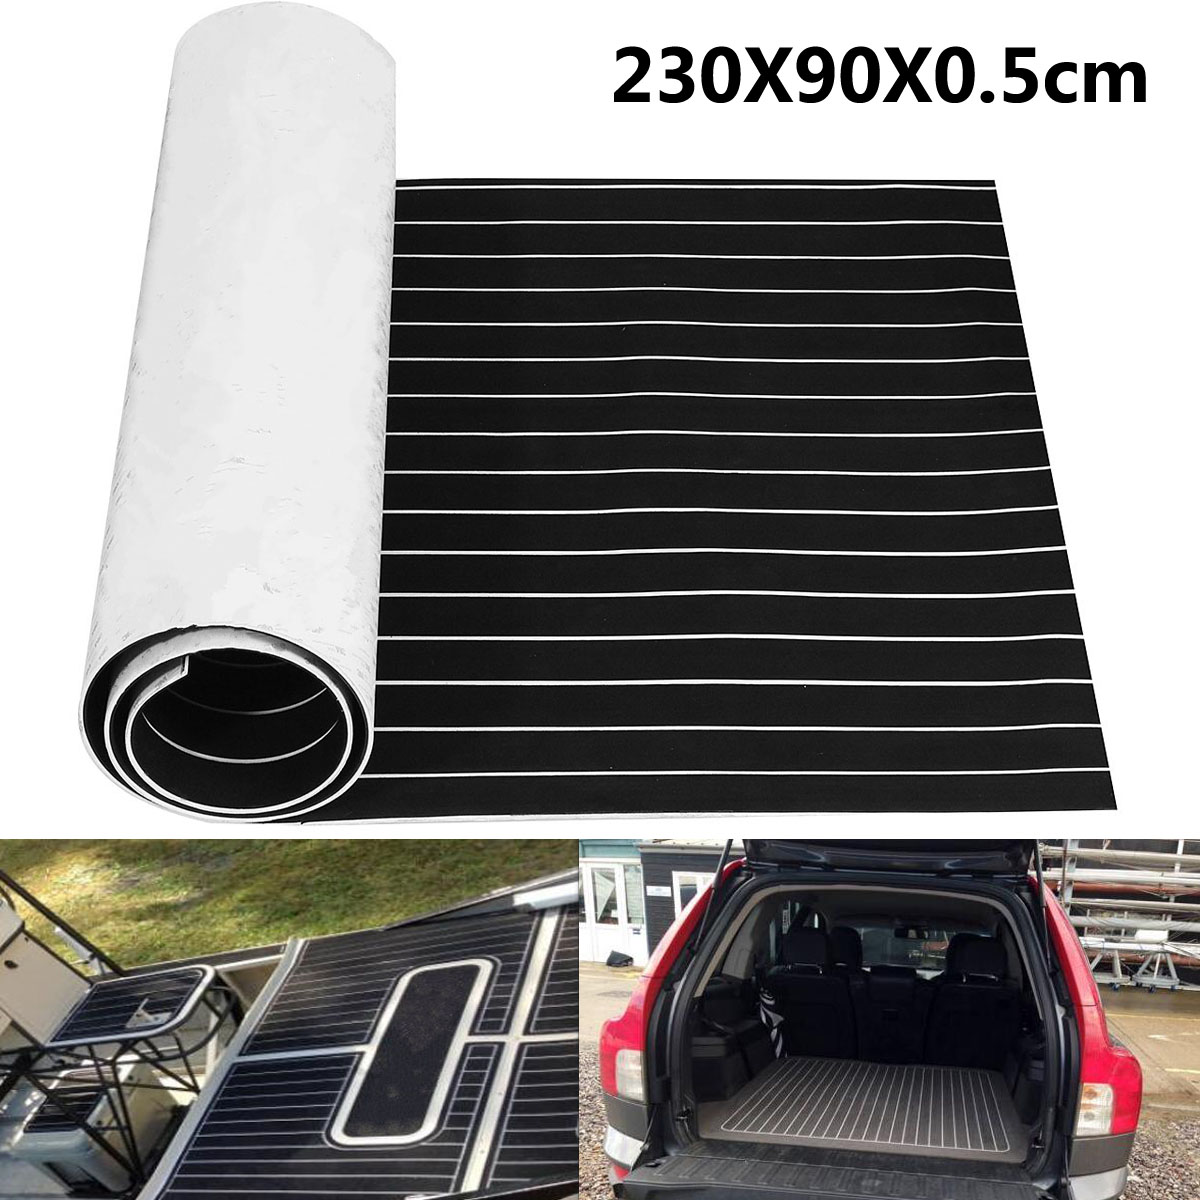 "Autoleader 230x90x0.5cm EVA Foam Teak Mat Self Adhesive Boat Yacht Black With White Lines Boat Flooring Teak Decking Sheet Pad teak house раковина ""round white"""